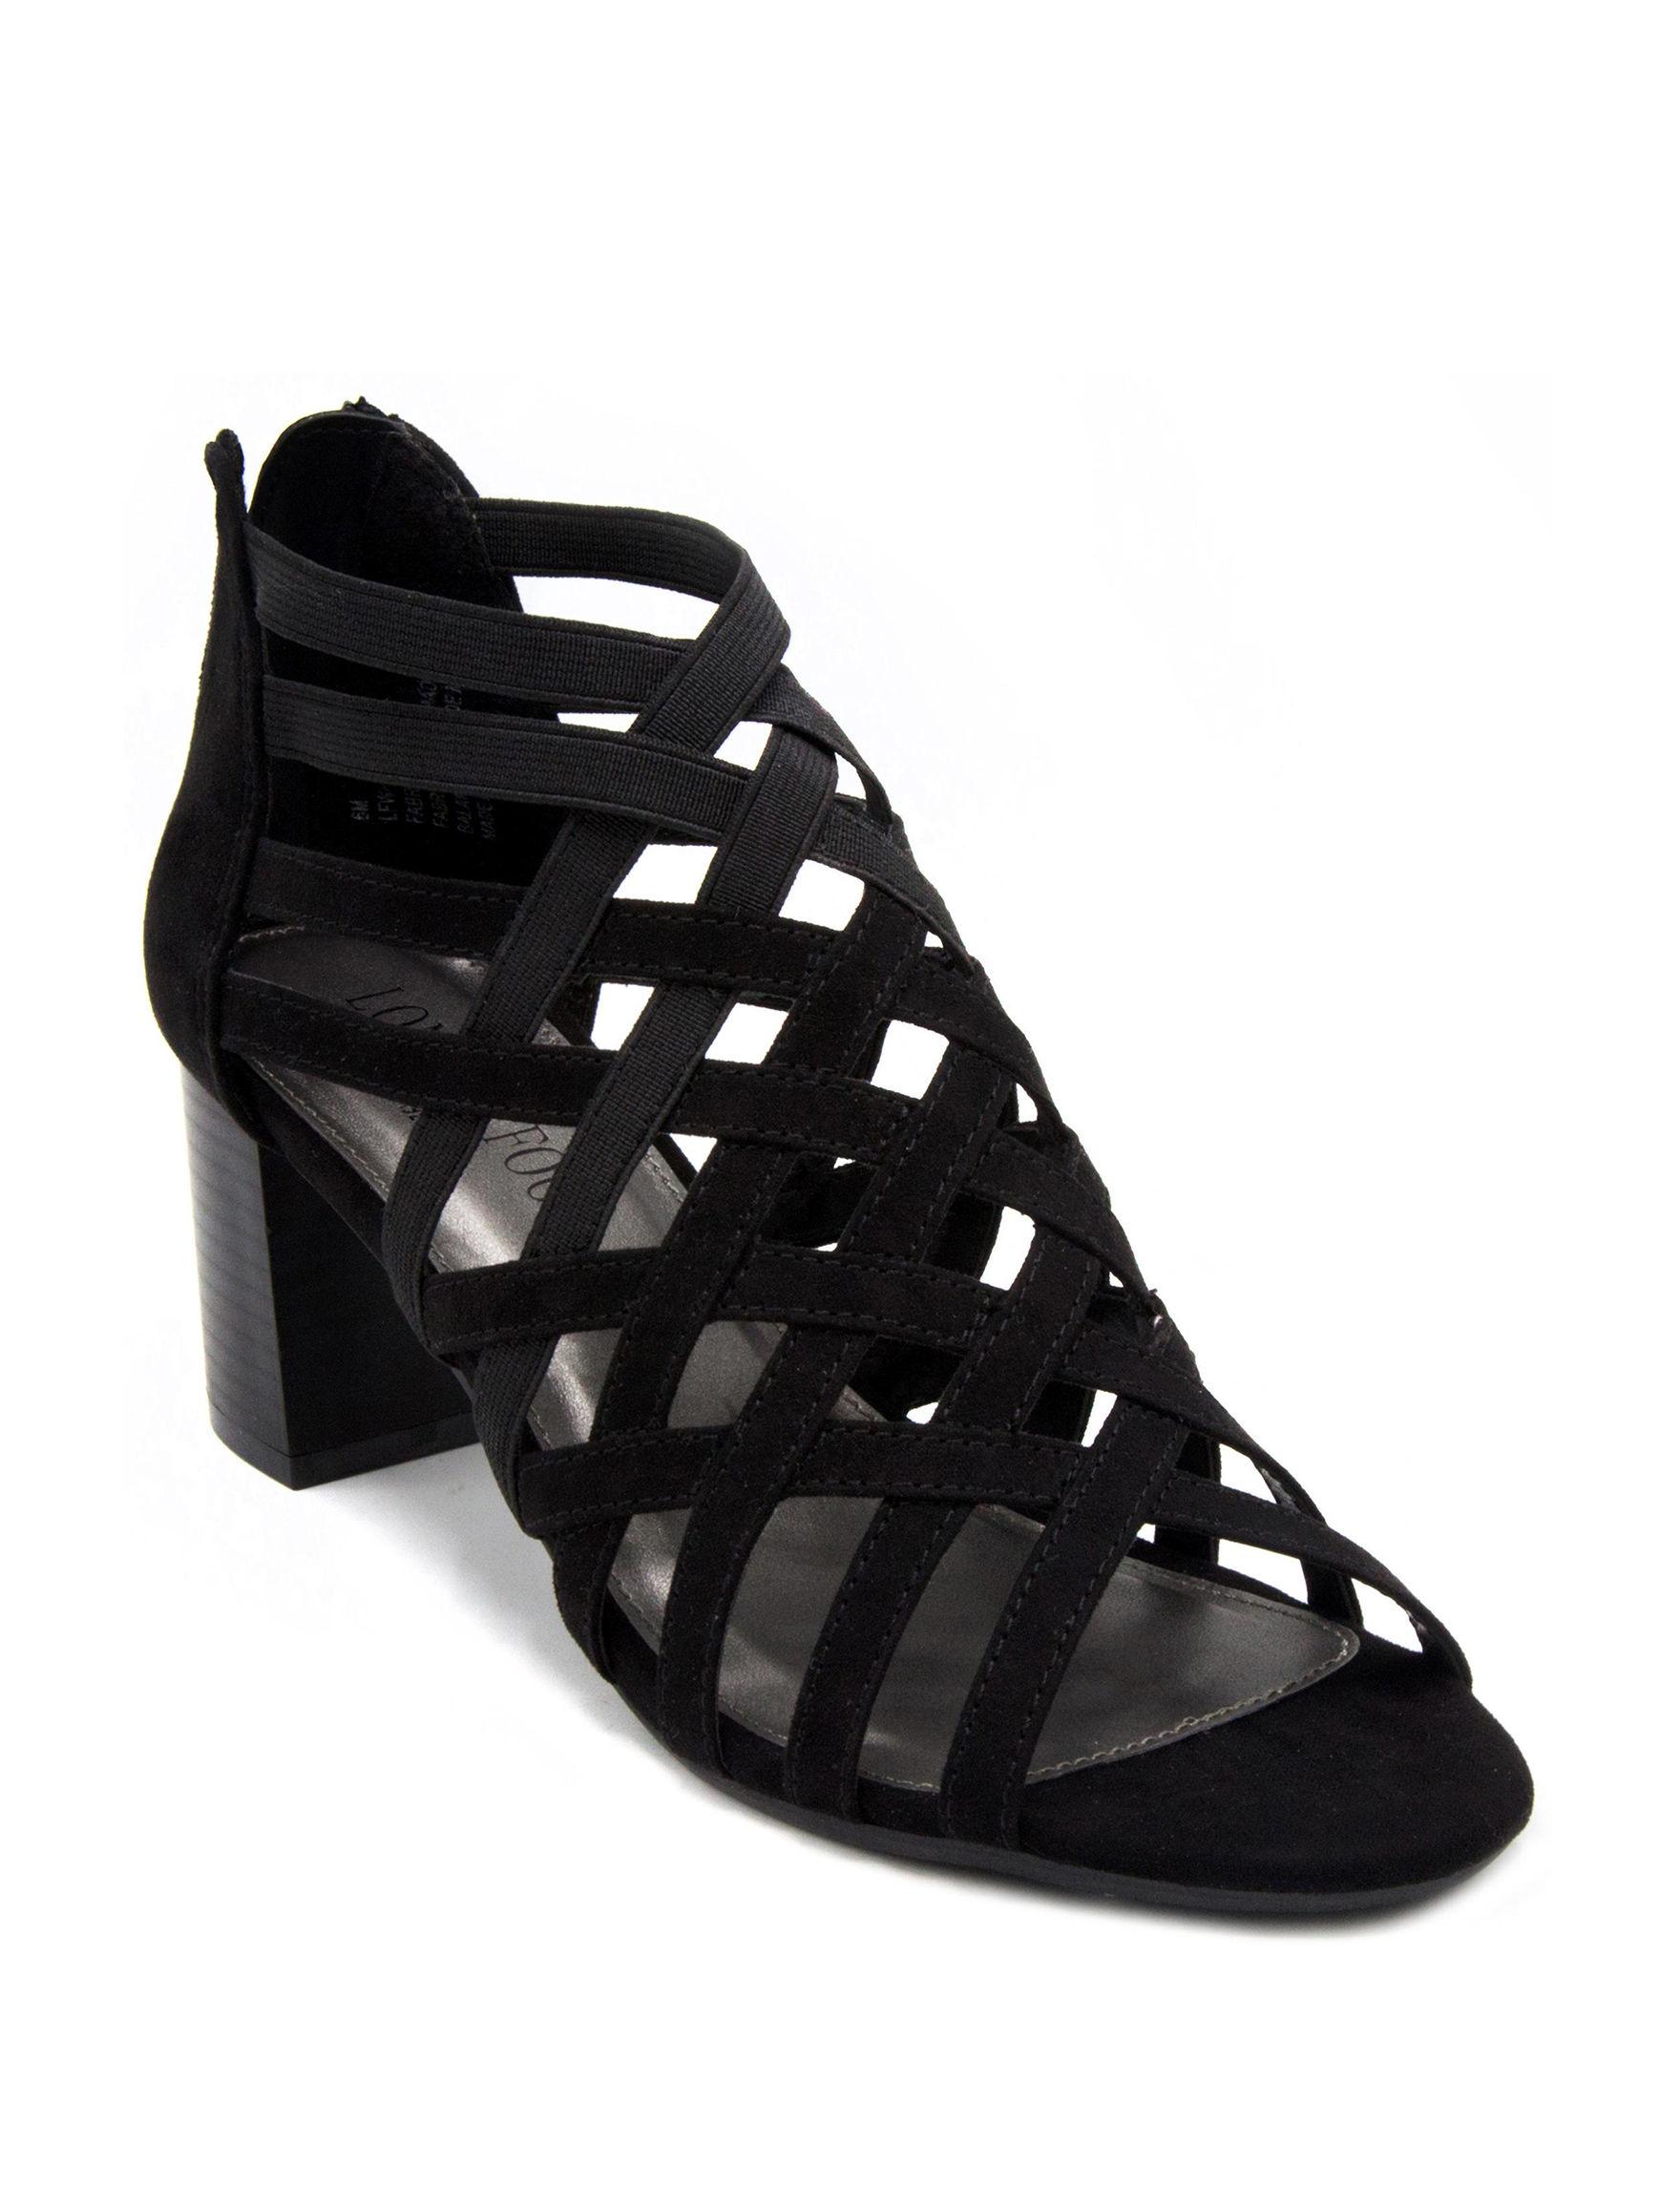 London Fog Black Heeled Sandals